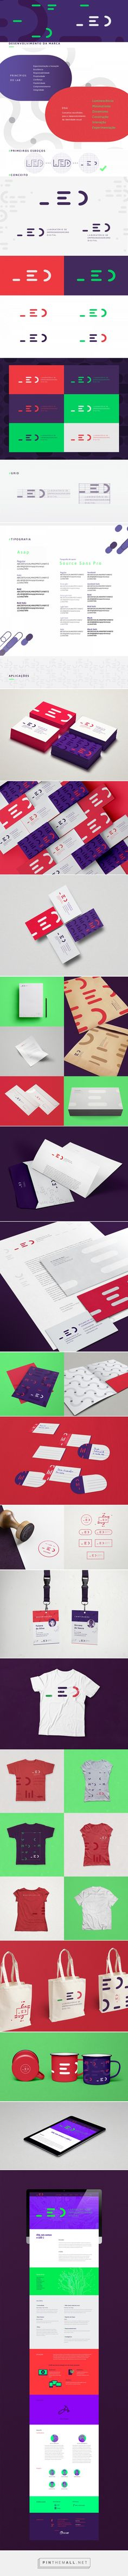 LED | Identidade Visual on Behance - created via https://pinthemall.net